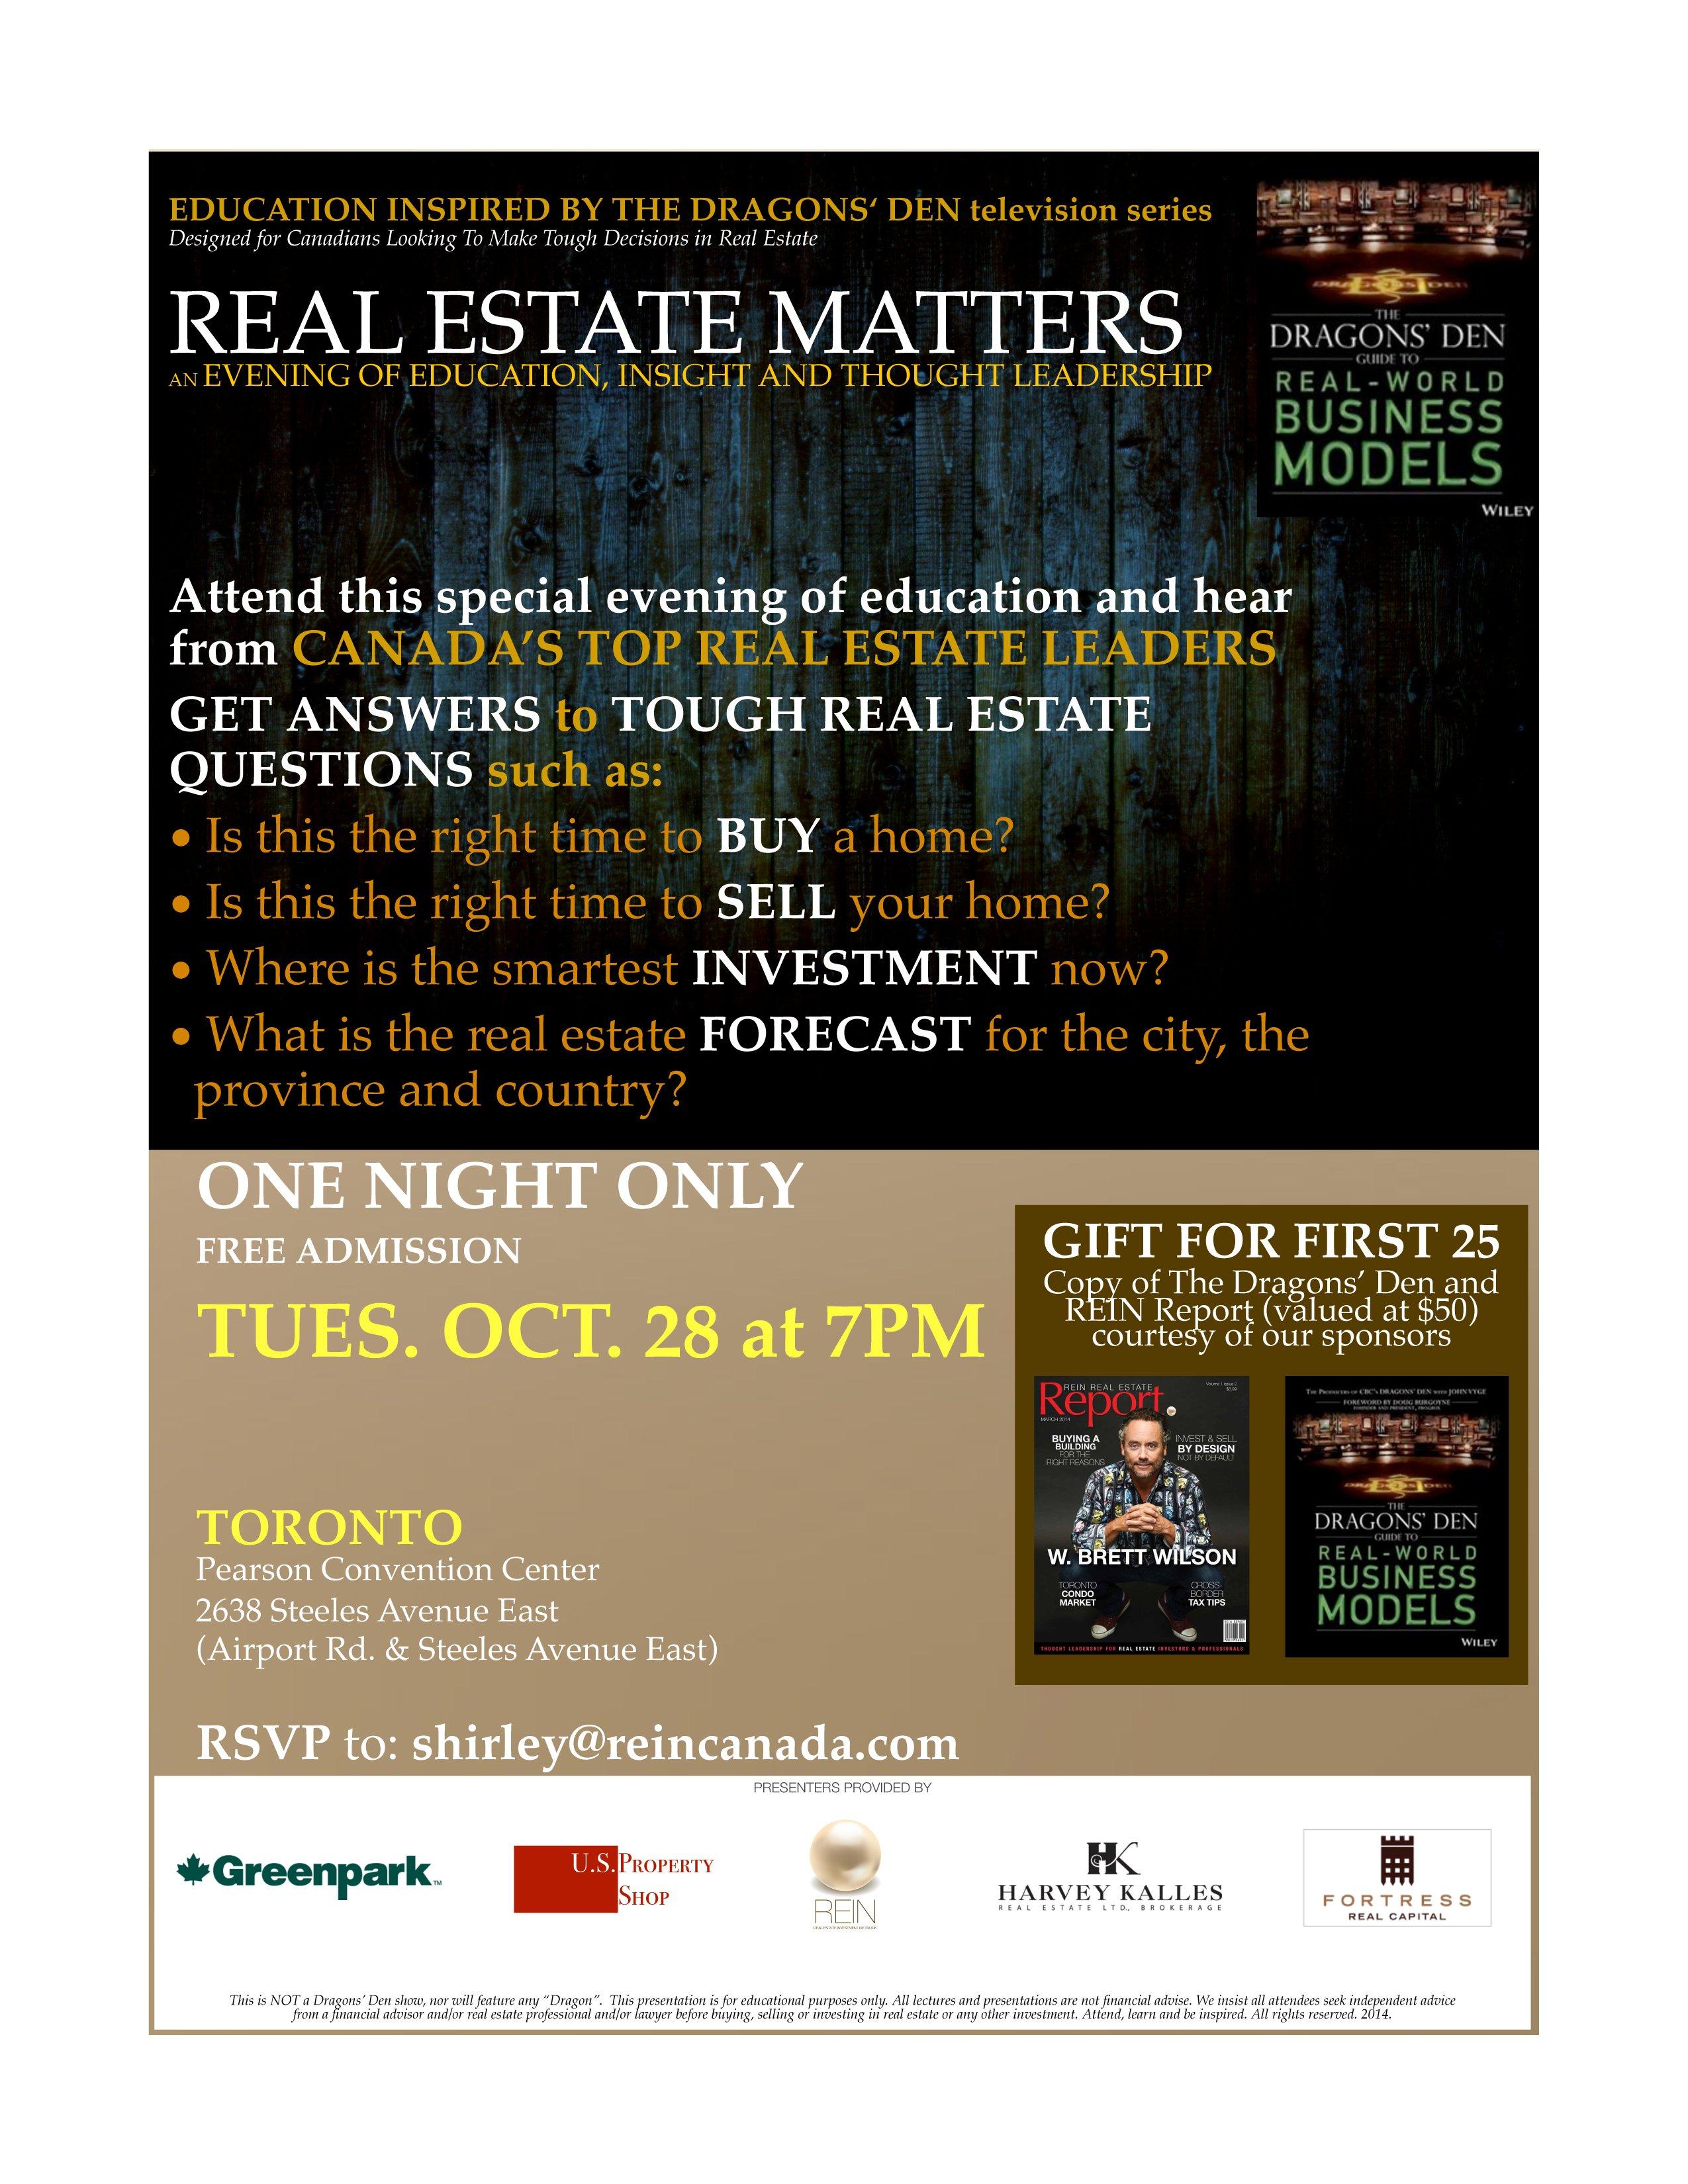 Real_Estate_Matters_Event_Circular_2014_(2)_(1)-2